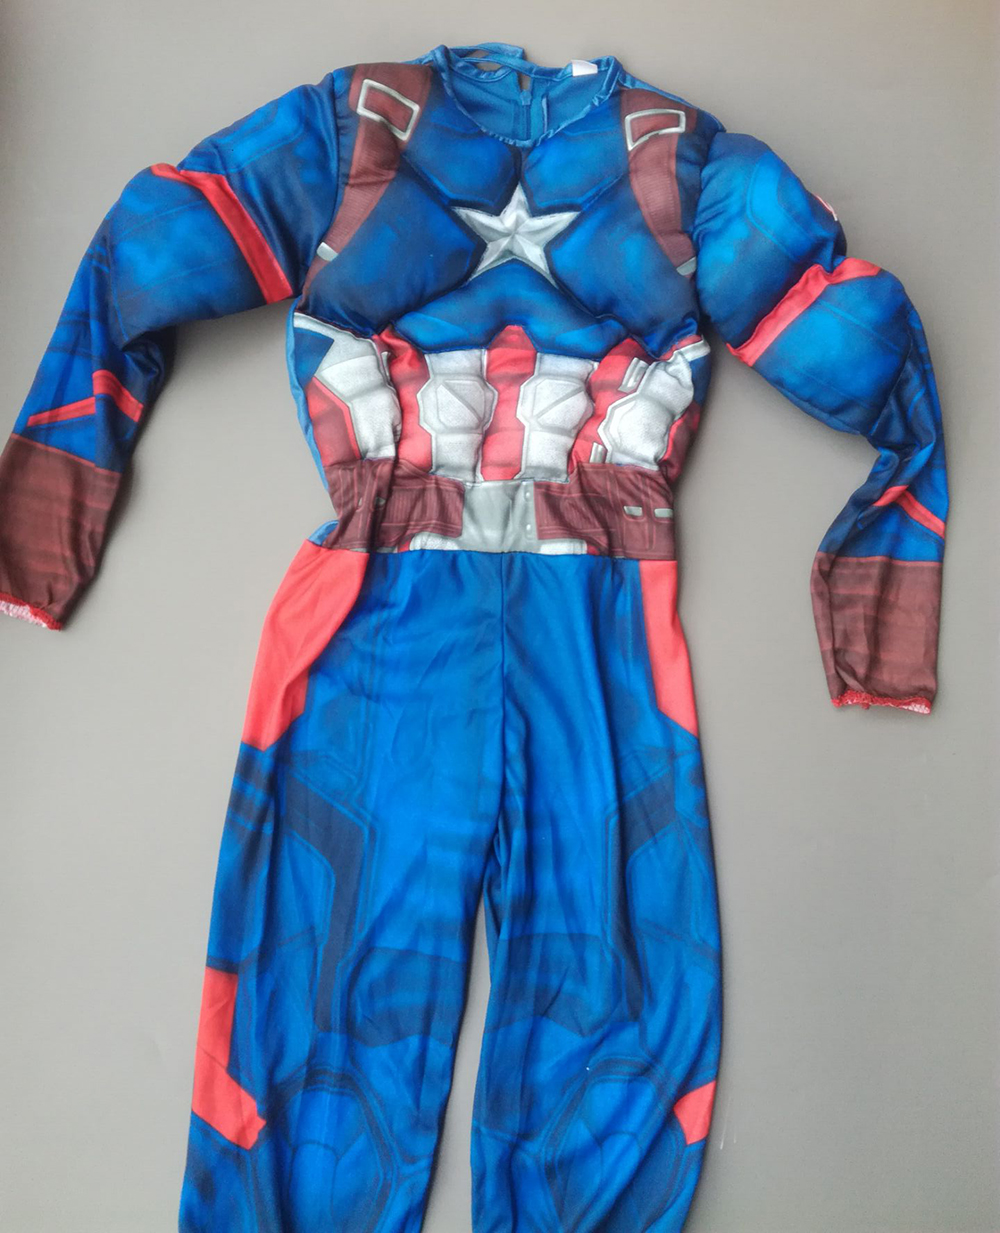 Superhero Kids Muscle Captain America Kostym Avengers Child Cosplay - Nye produkter - Bilde 5